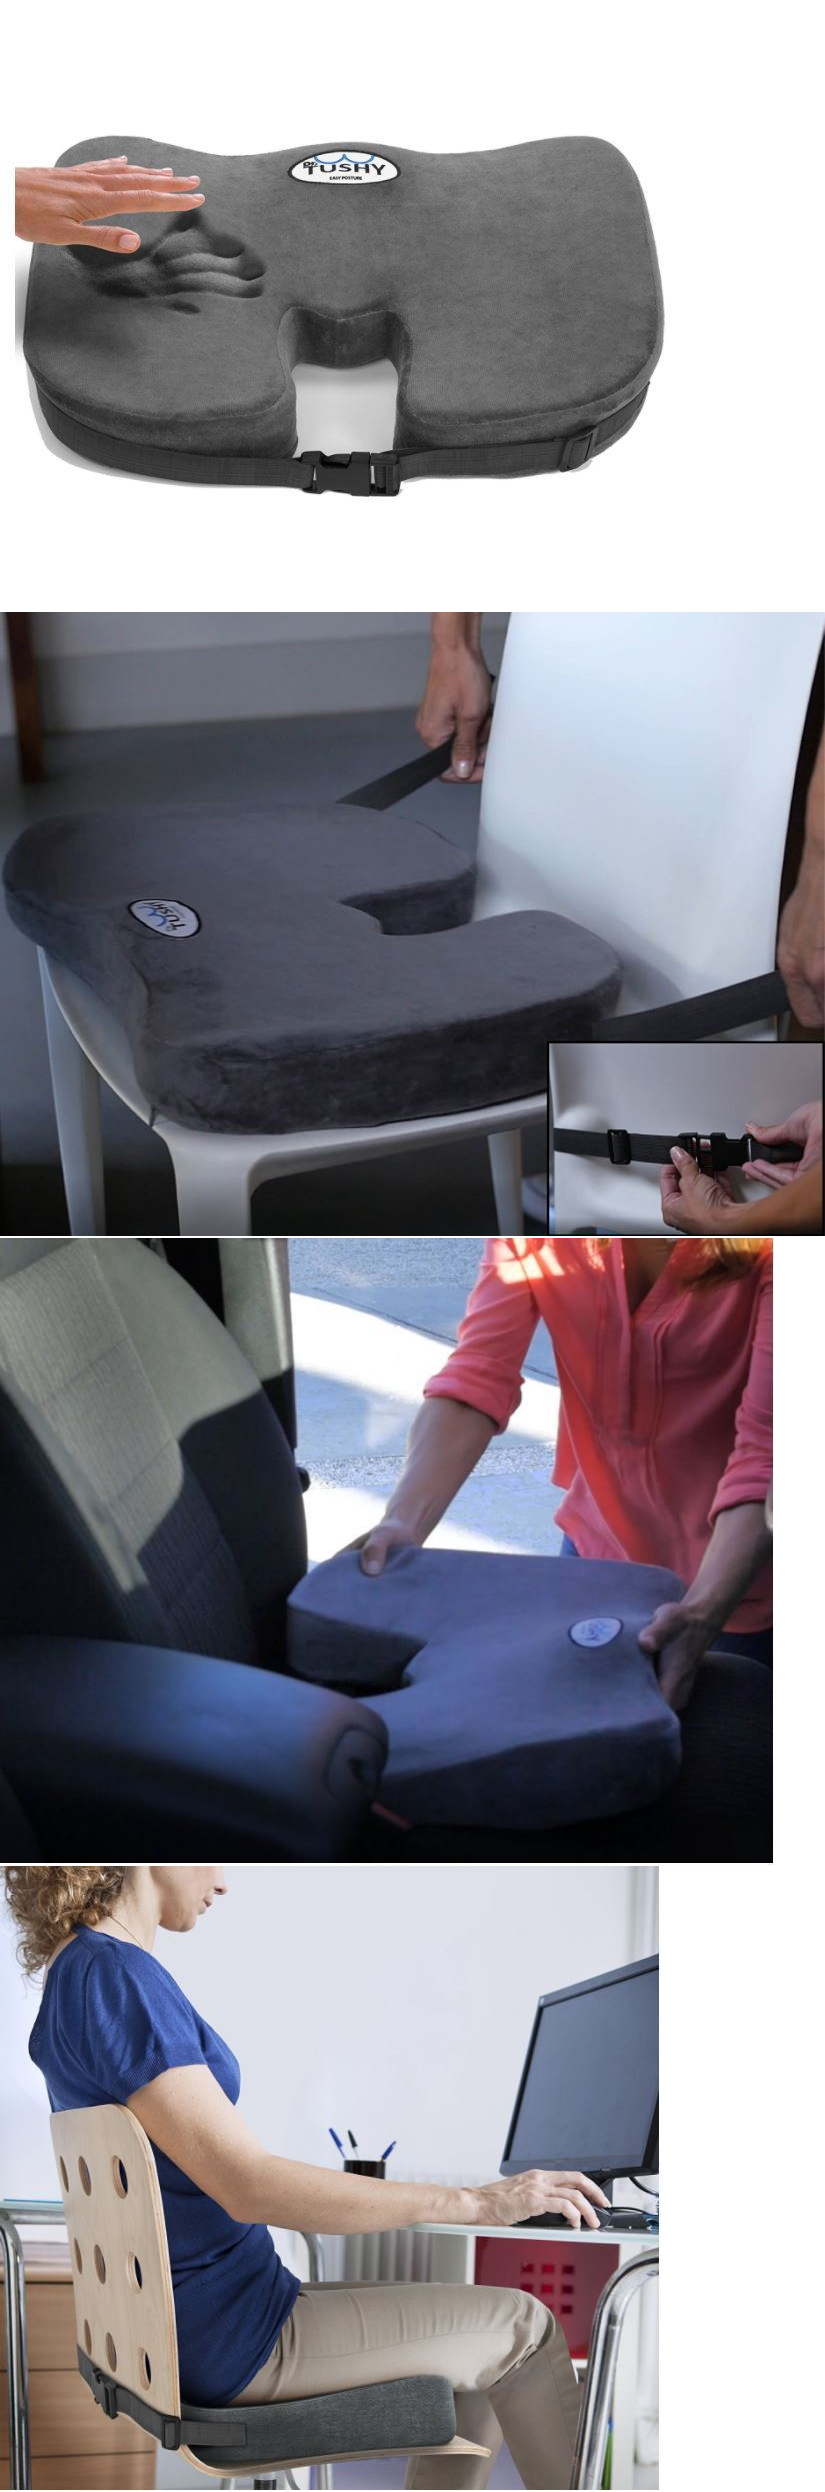 Seat and posture cushions truck driver seat cushion sciatica